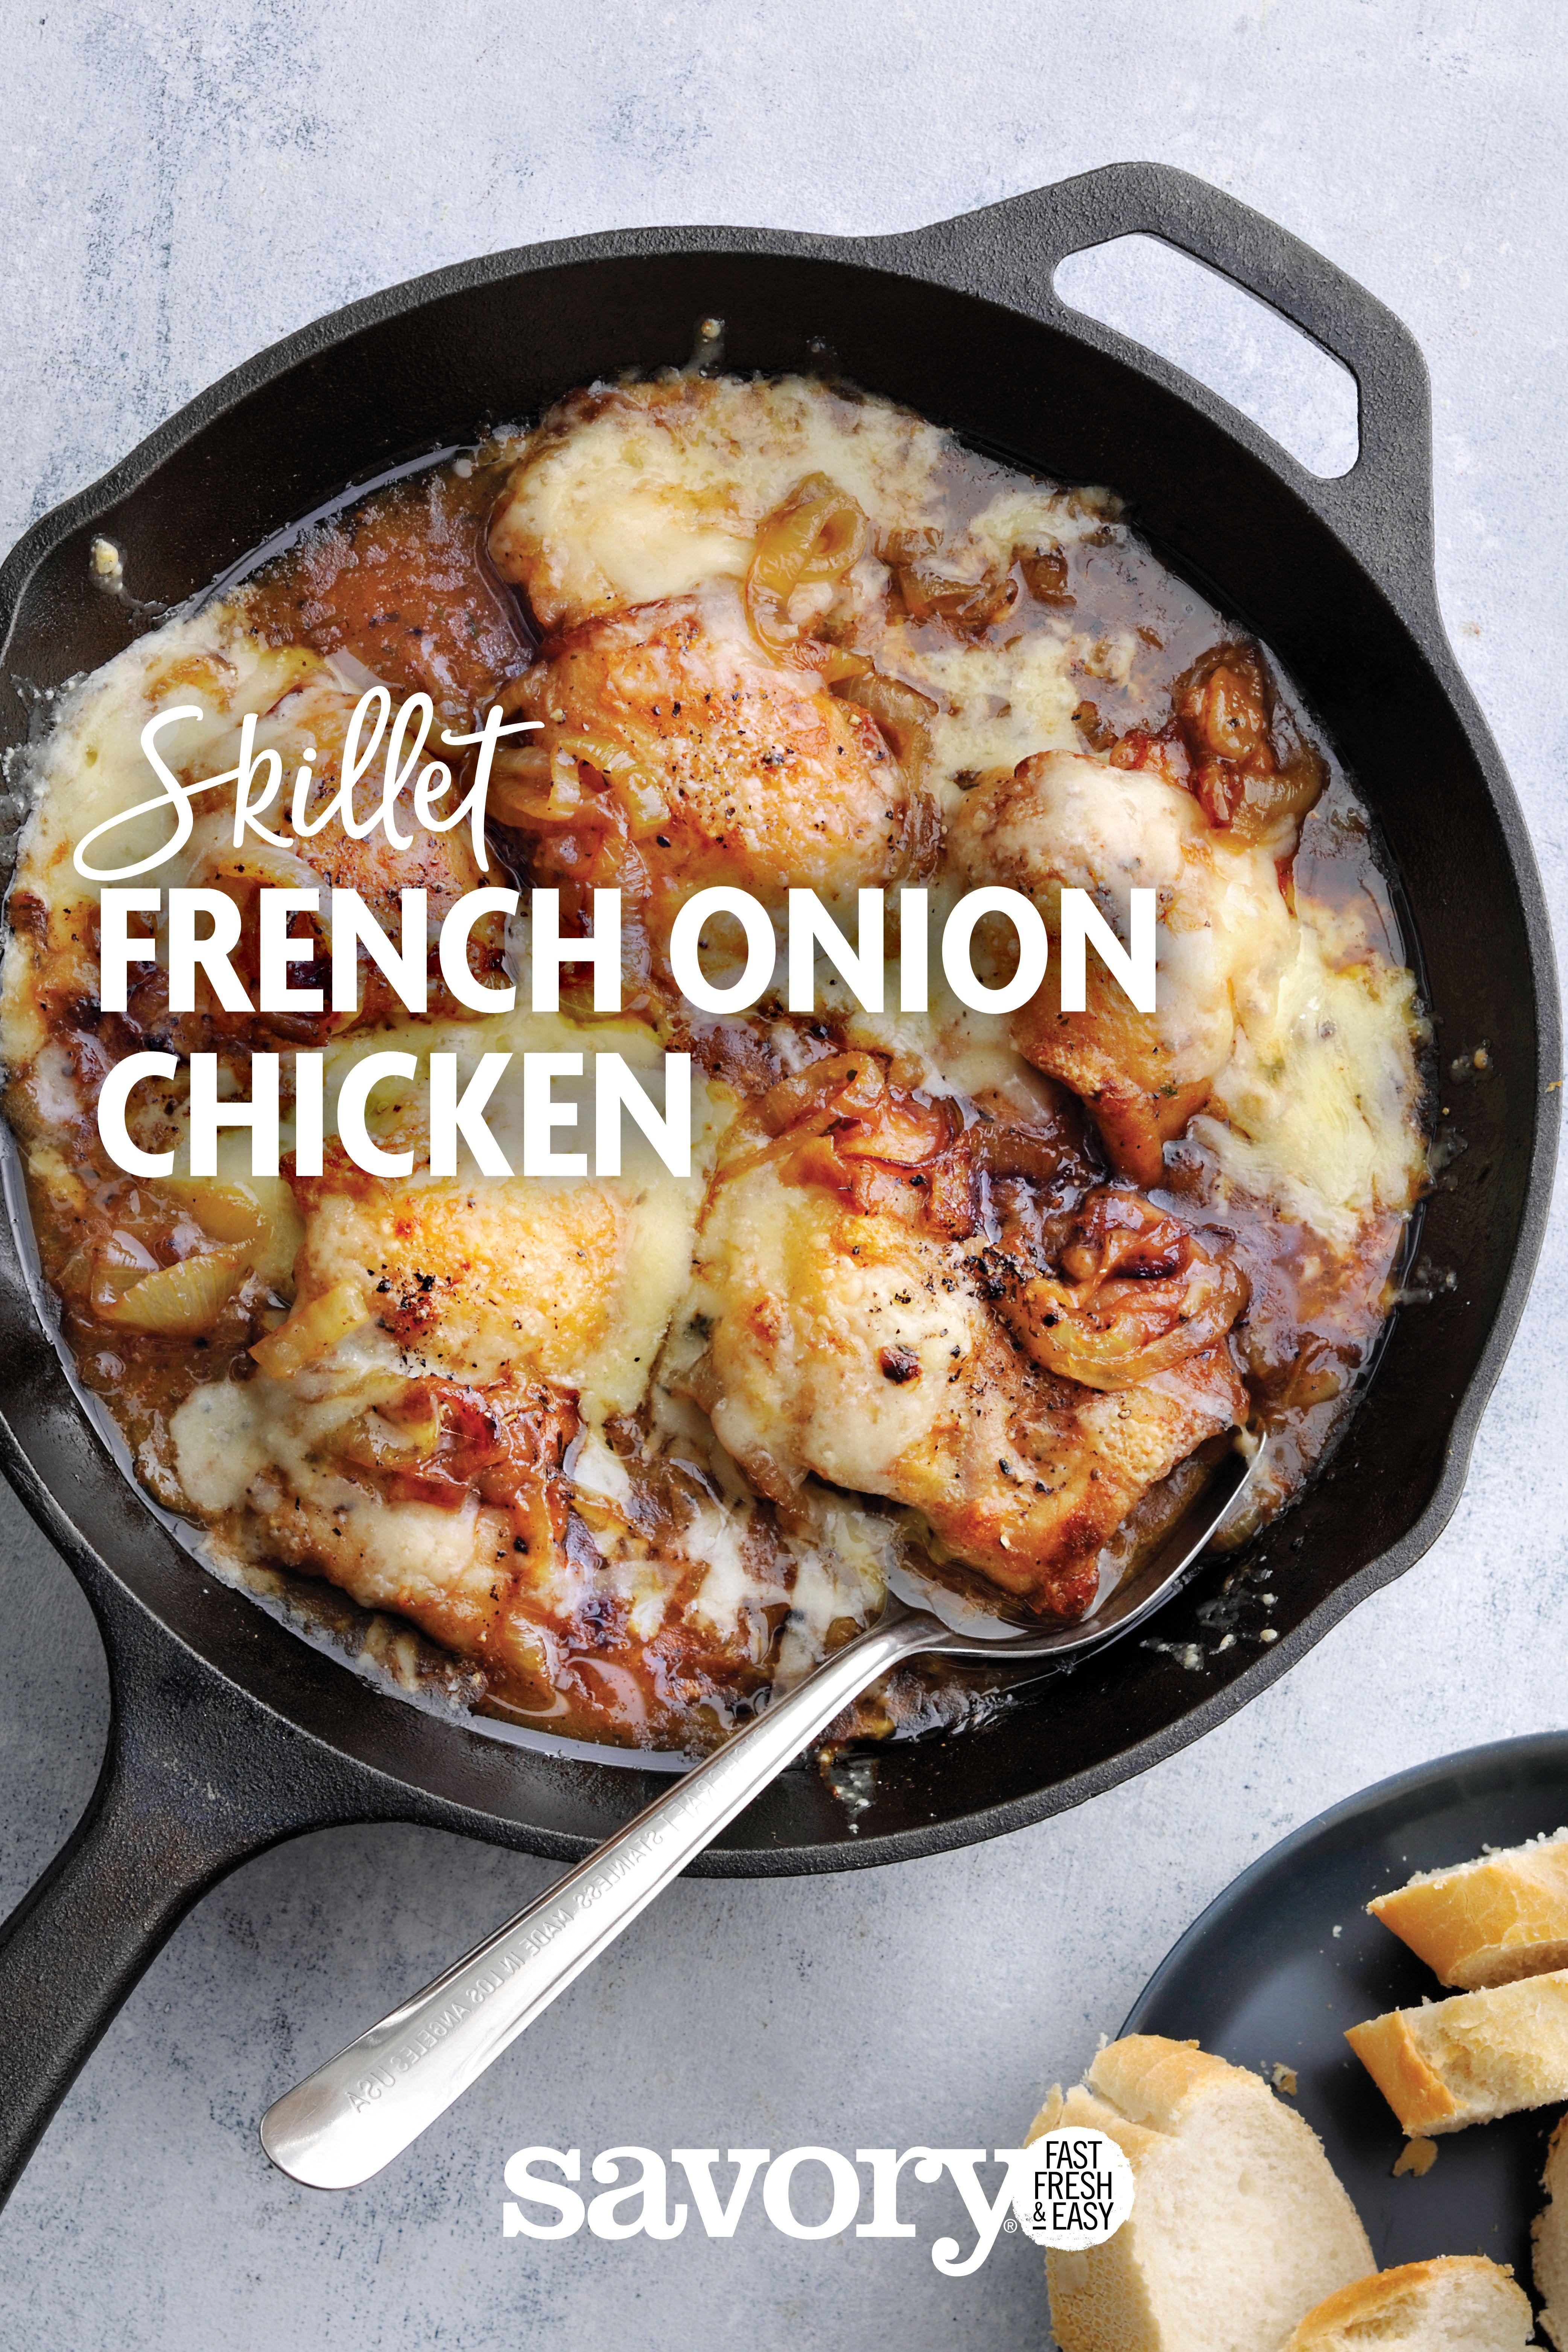 French Onion Chicken Savory Recipe Chicken Dinner Recipes Chicken Recipes Recipes